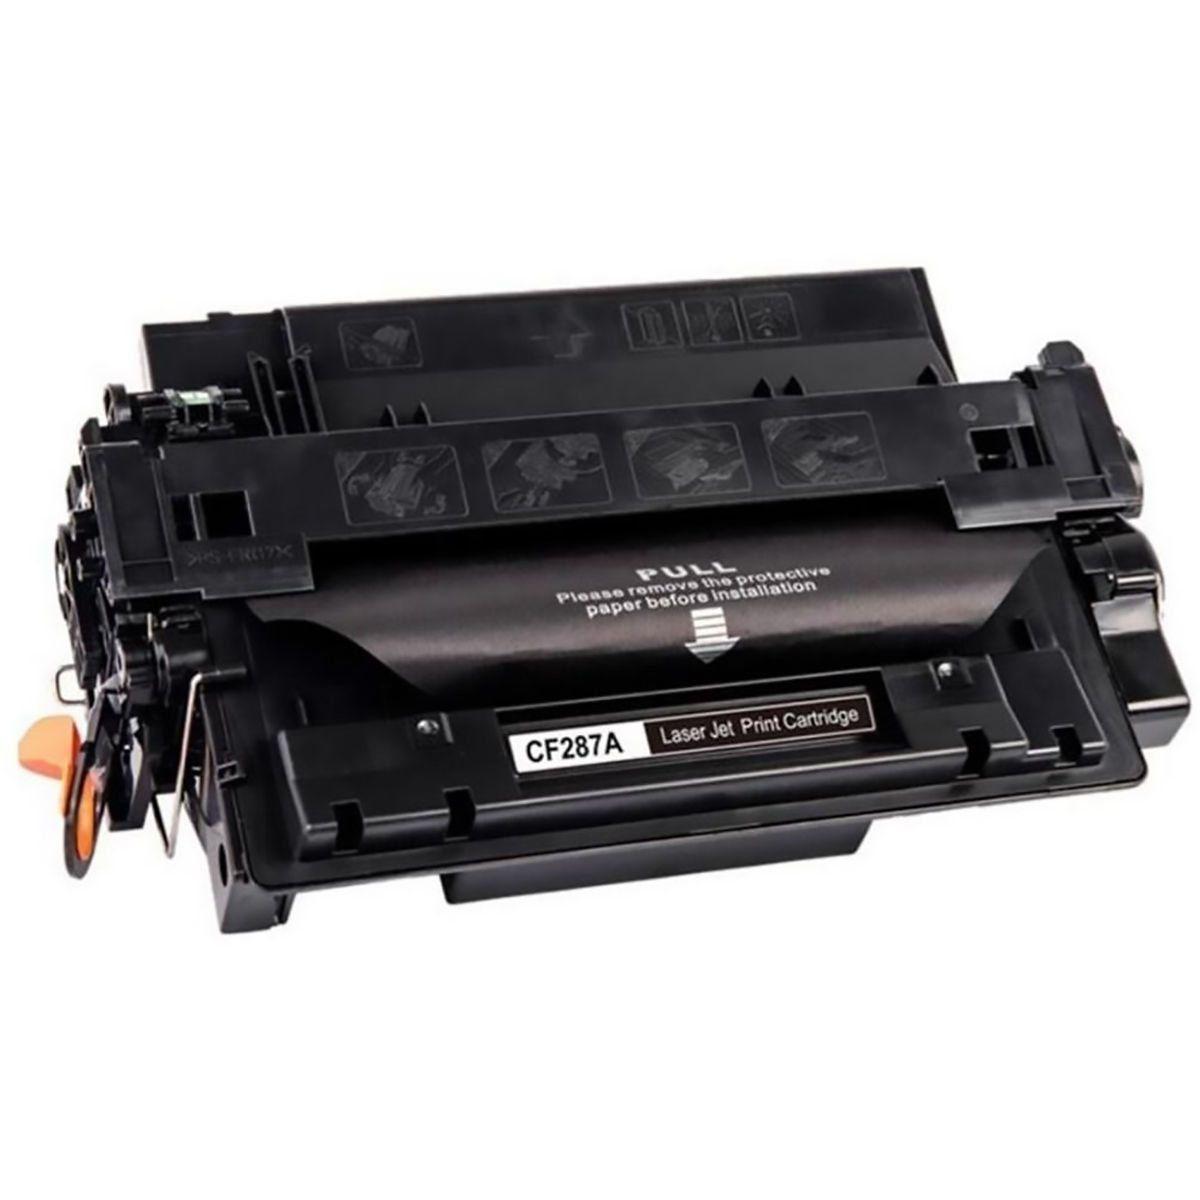 Compatível: Toner CF287A 287A 87A para HP M501 M501dn M506 M506dn M506x M527 M527dn M527c M505x 506n / Preto / 9.000